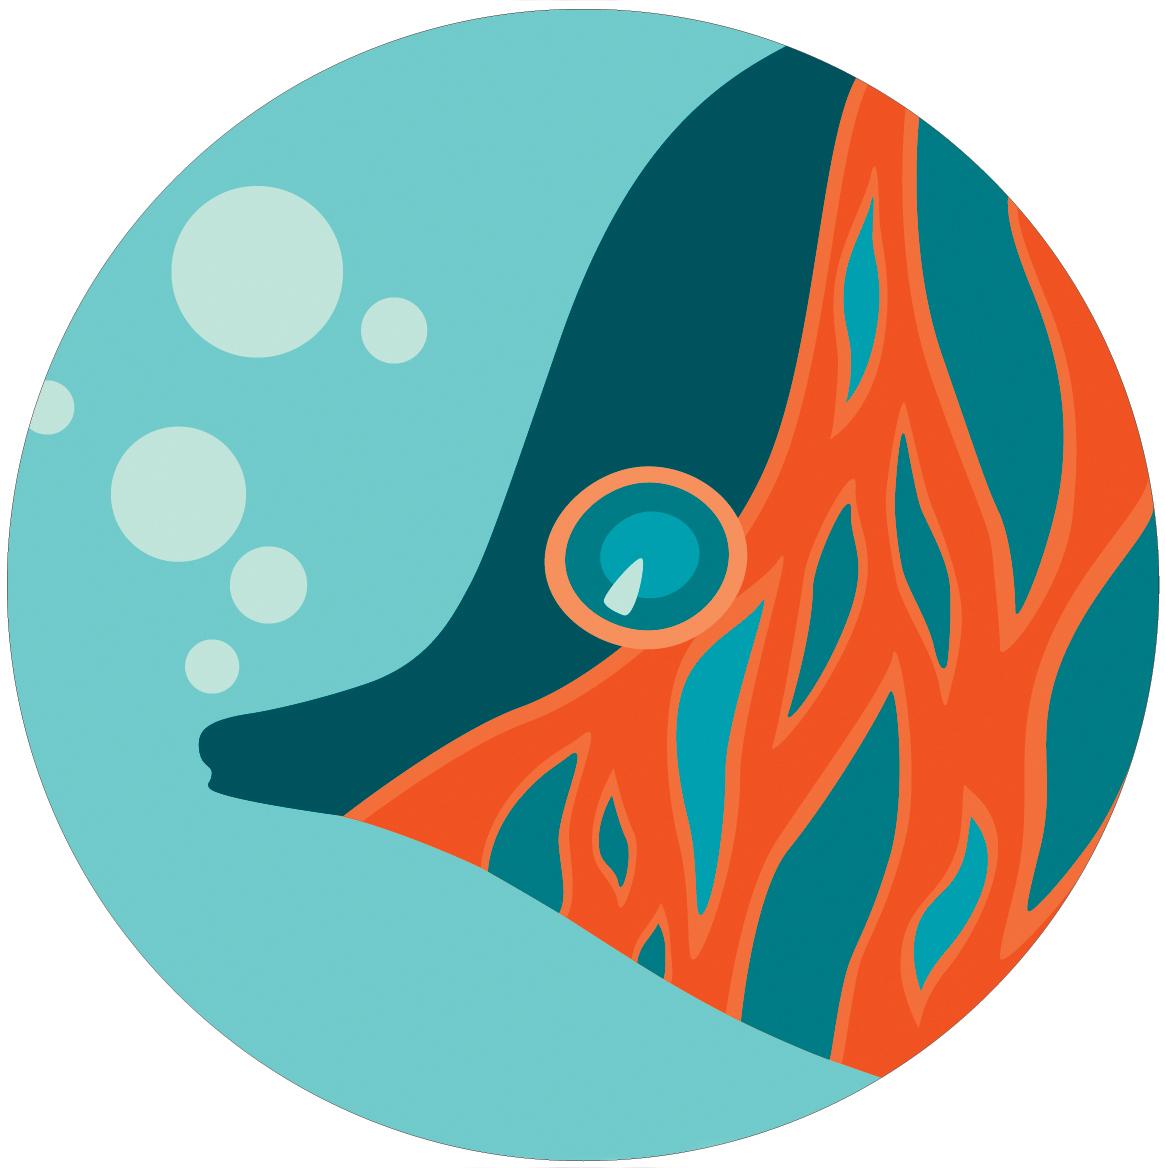 Aquatic series - fresh